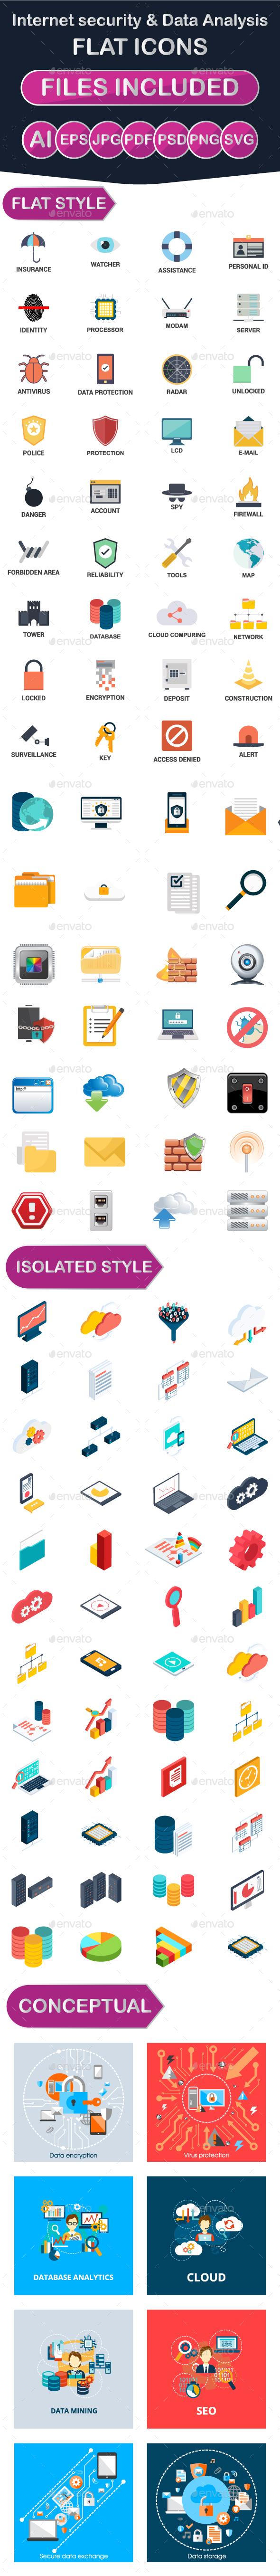 Internet Security & Data Analysis Icons - Web Icons